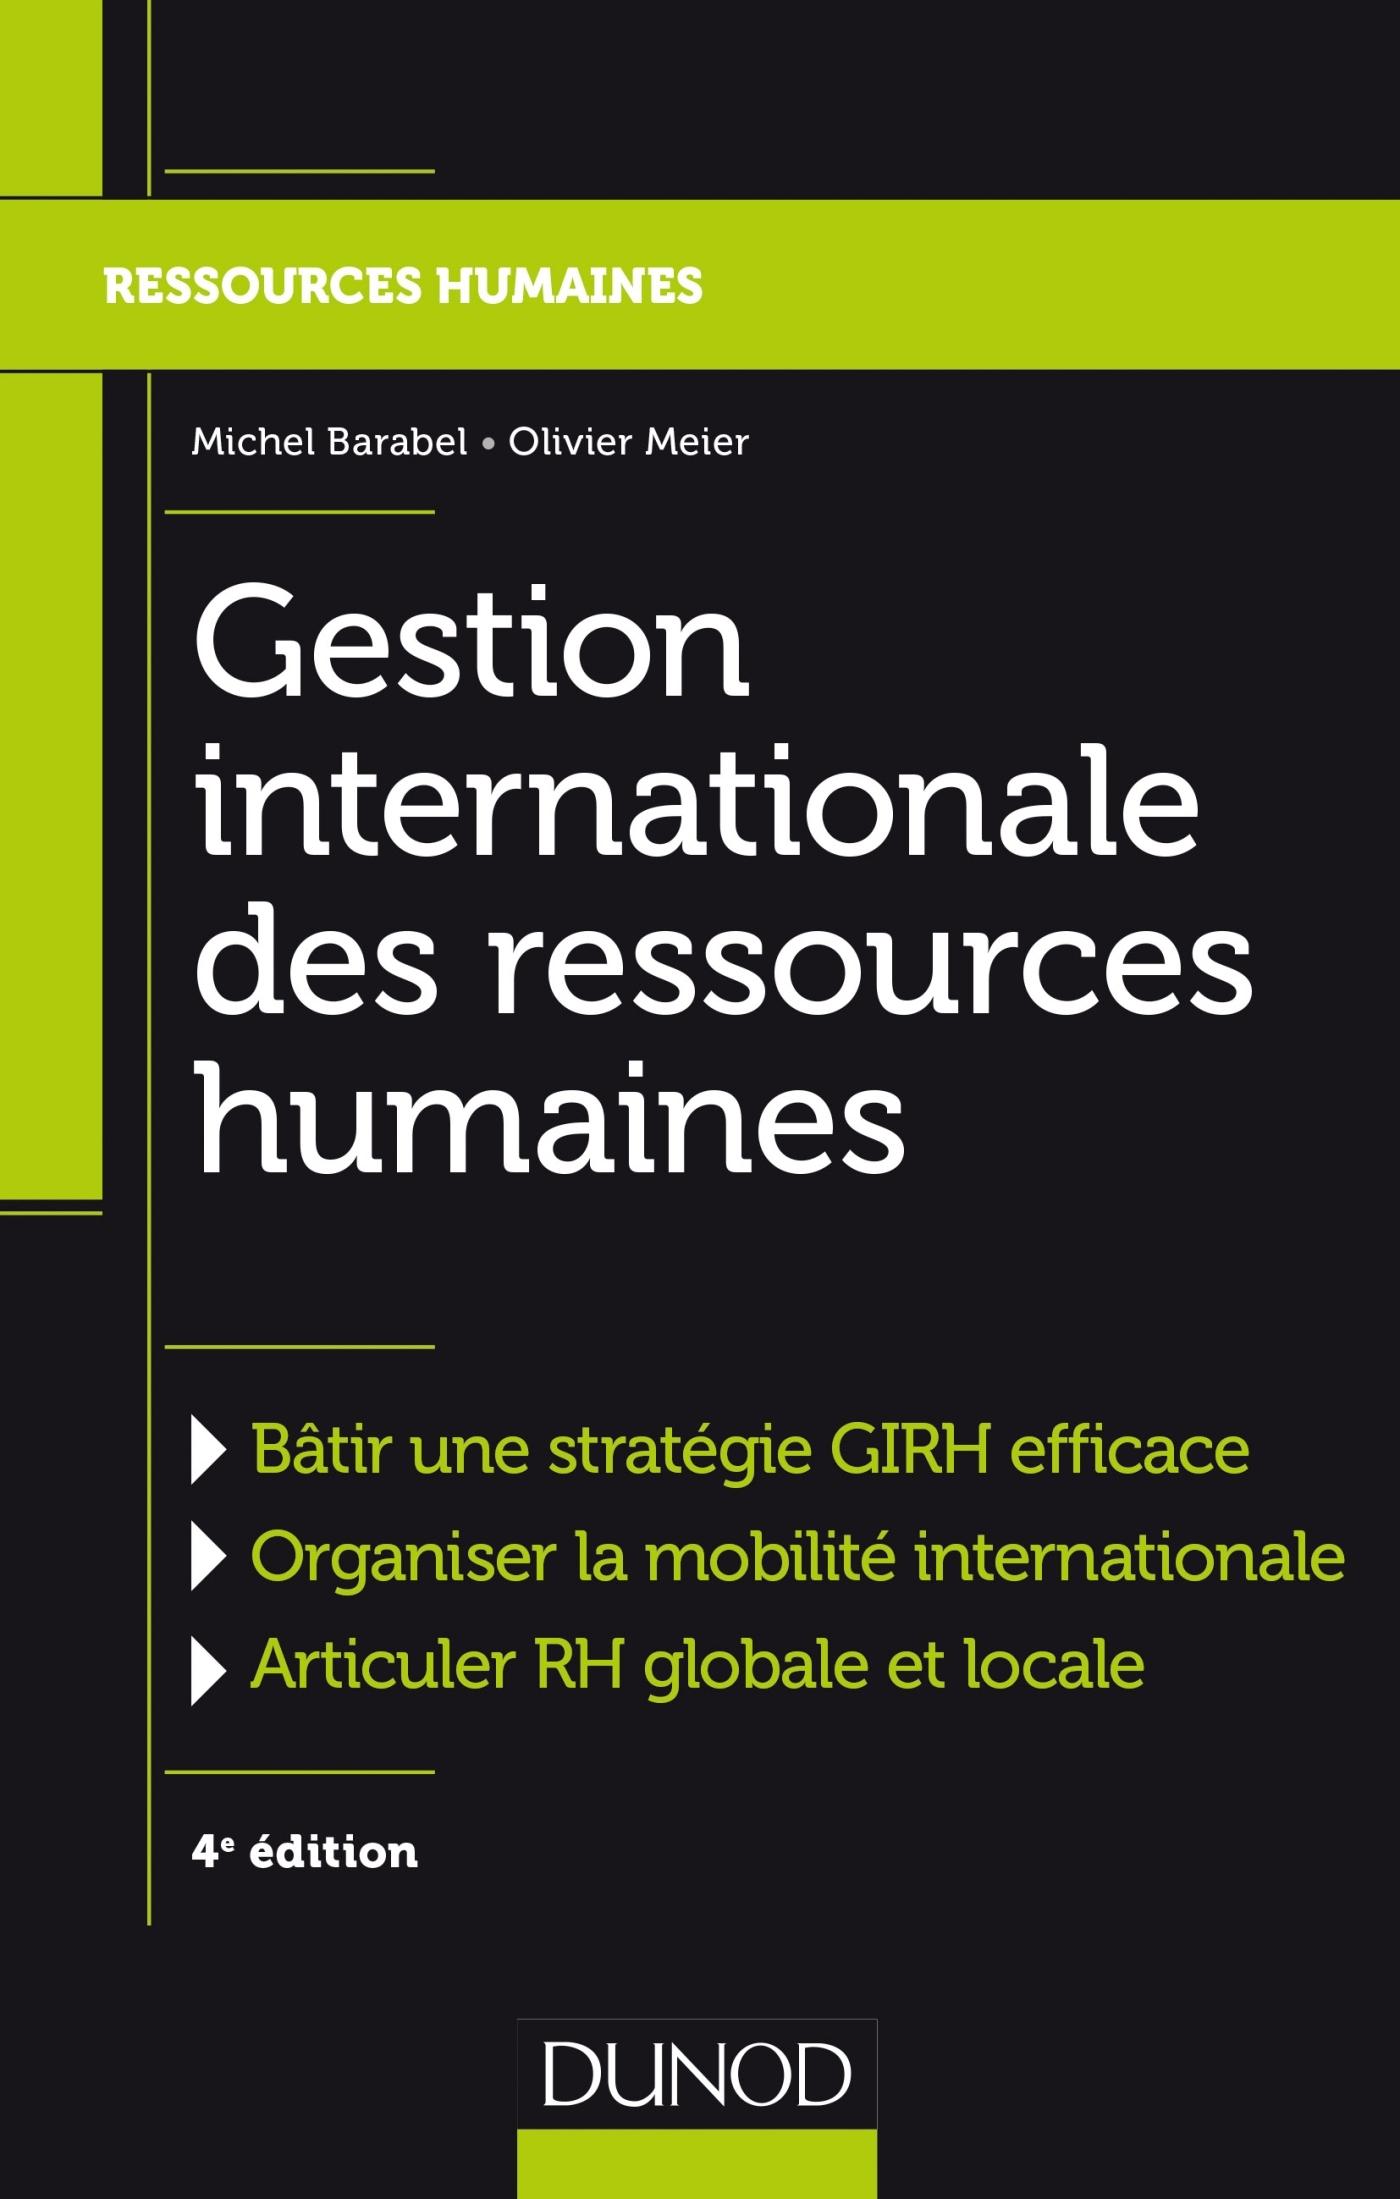 GESTION INTERNATIONALE DES RESSOURCES HUMAINES - 4E ED.